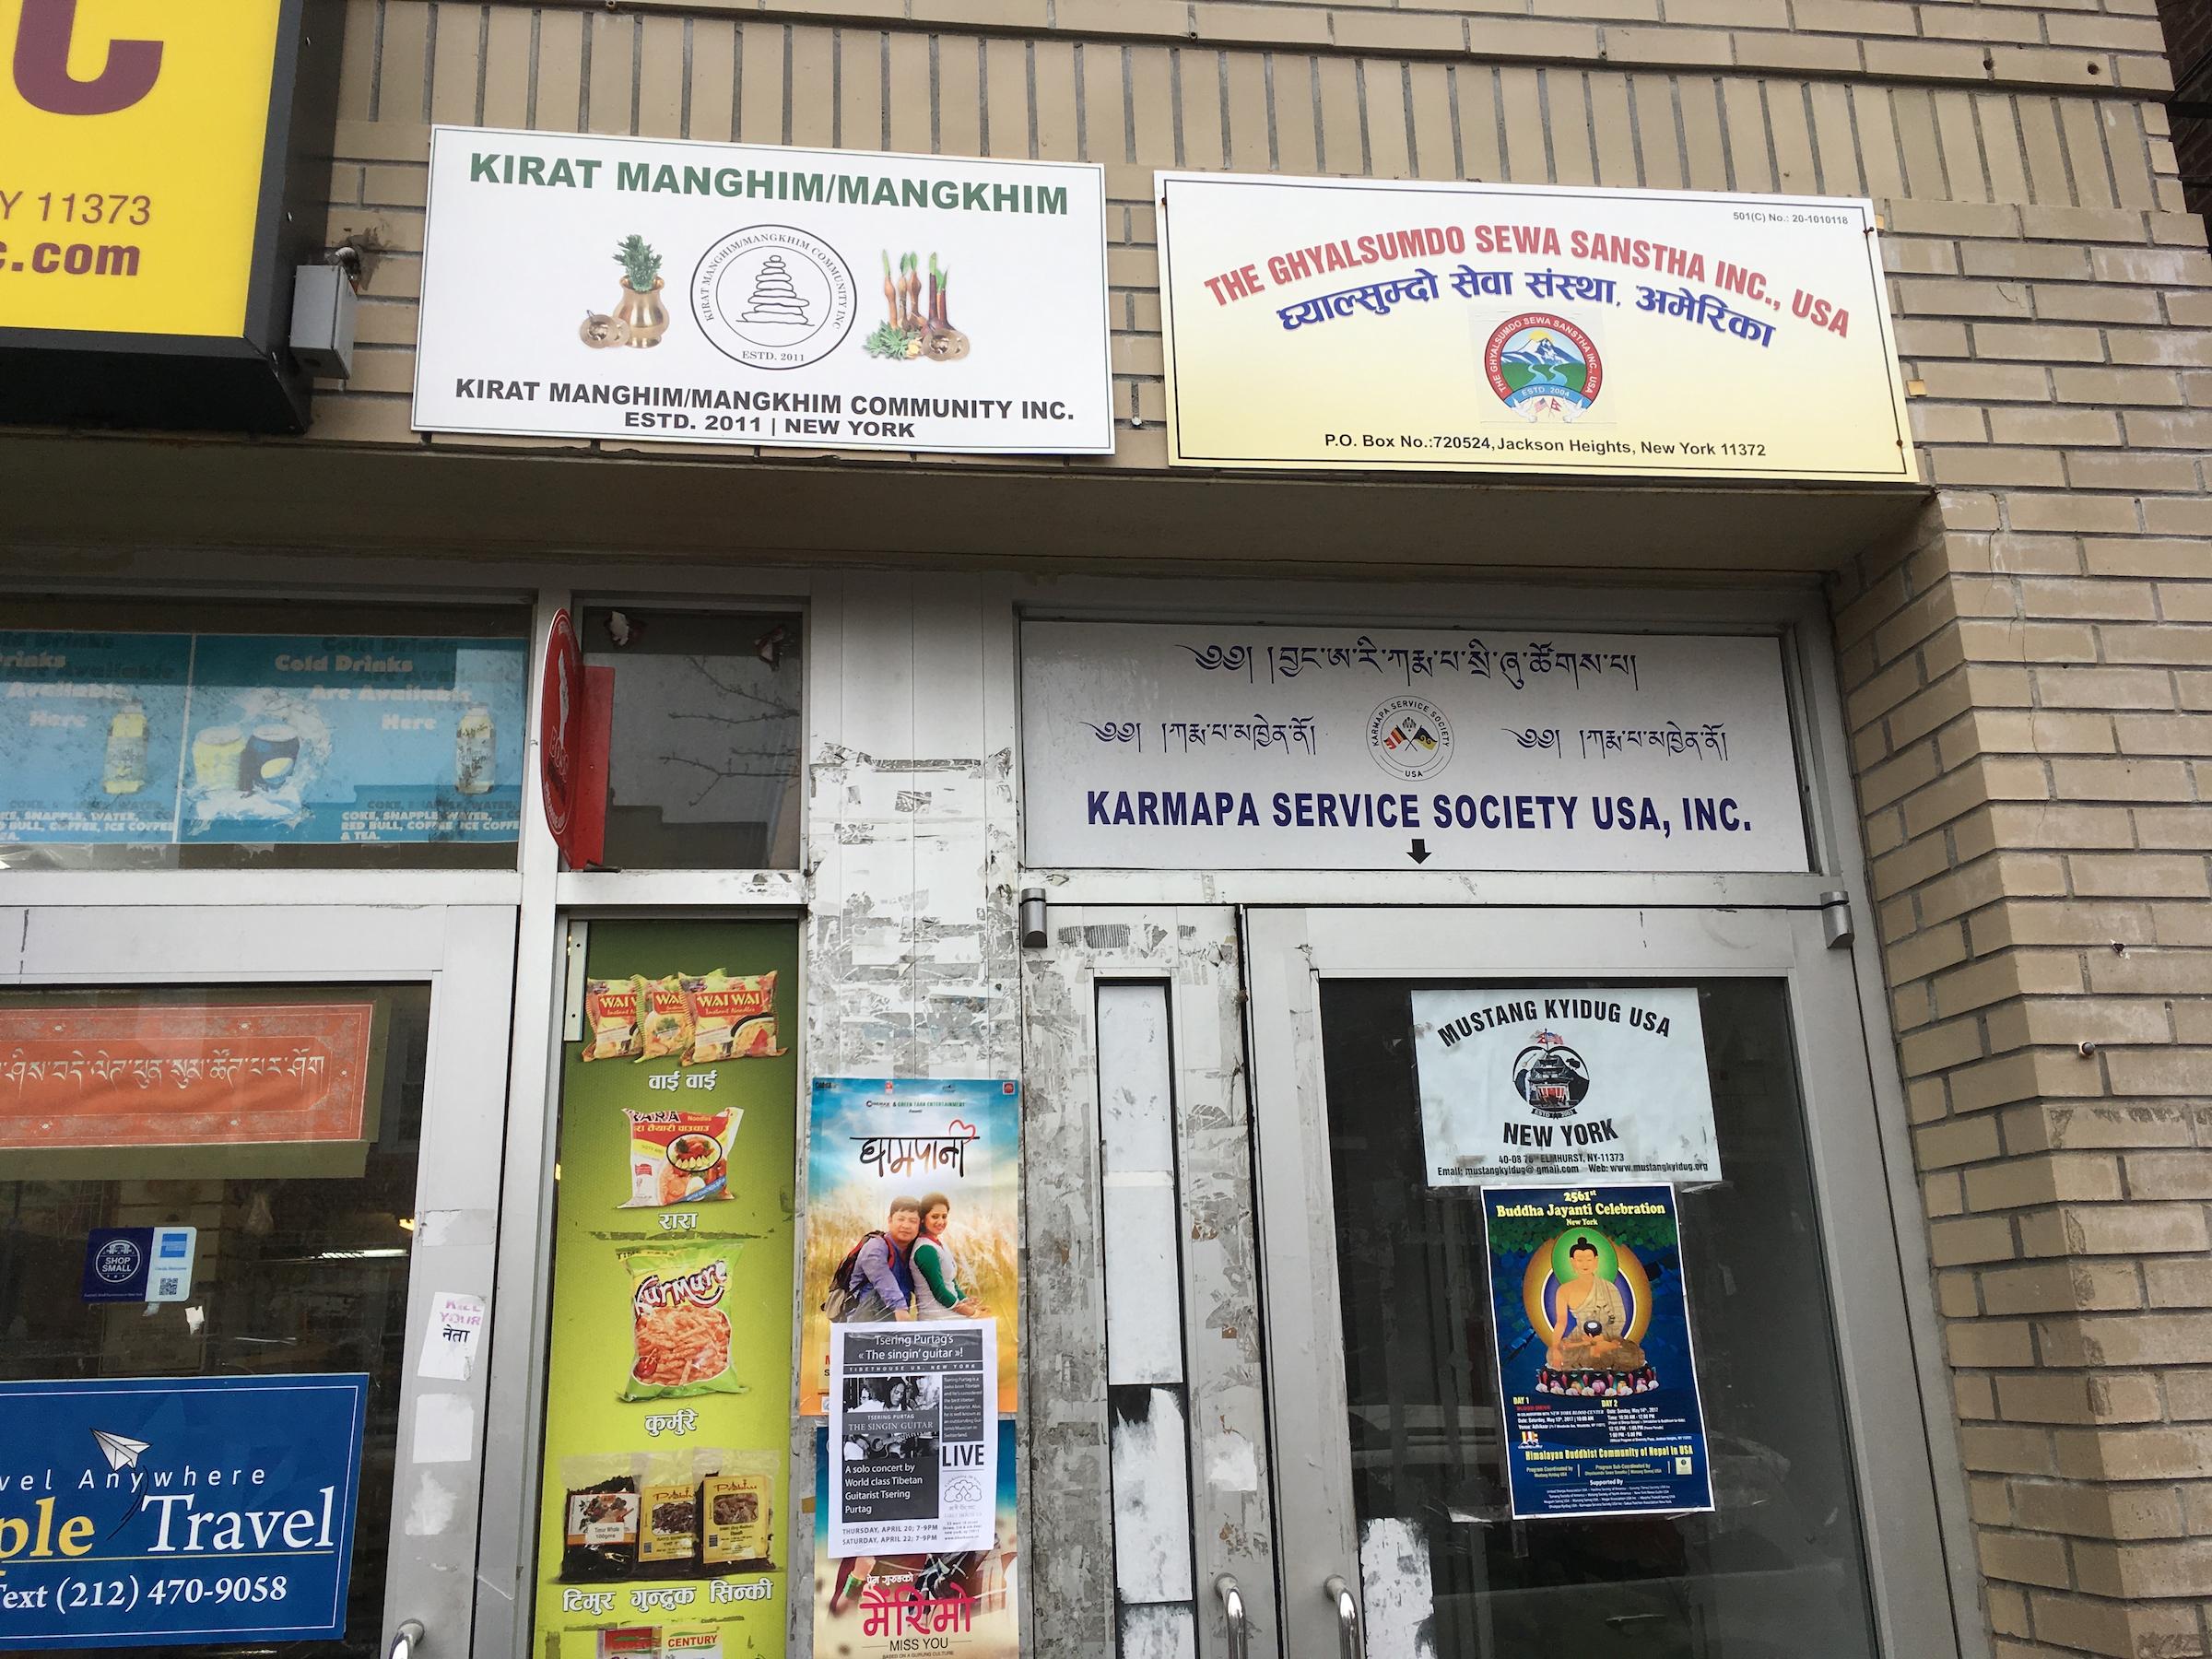 https://mk0itemsssrcorgqb419.kinstacdn.com/wp-content/uploads/2021/06/Kyidug-Central.jpg